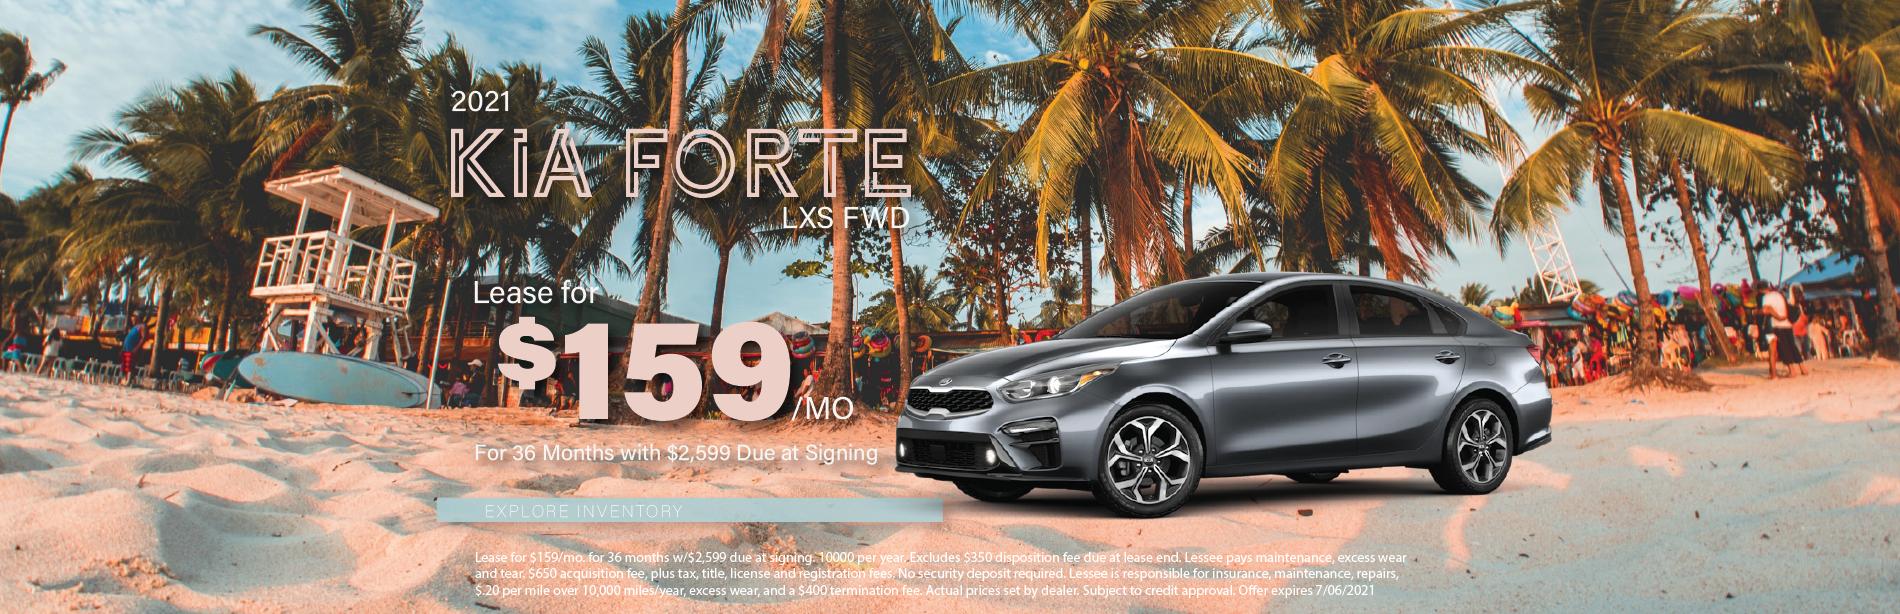 Lafontaine Kia Forte – May